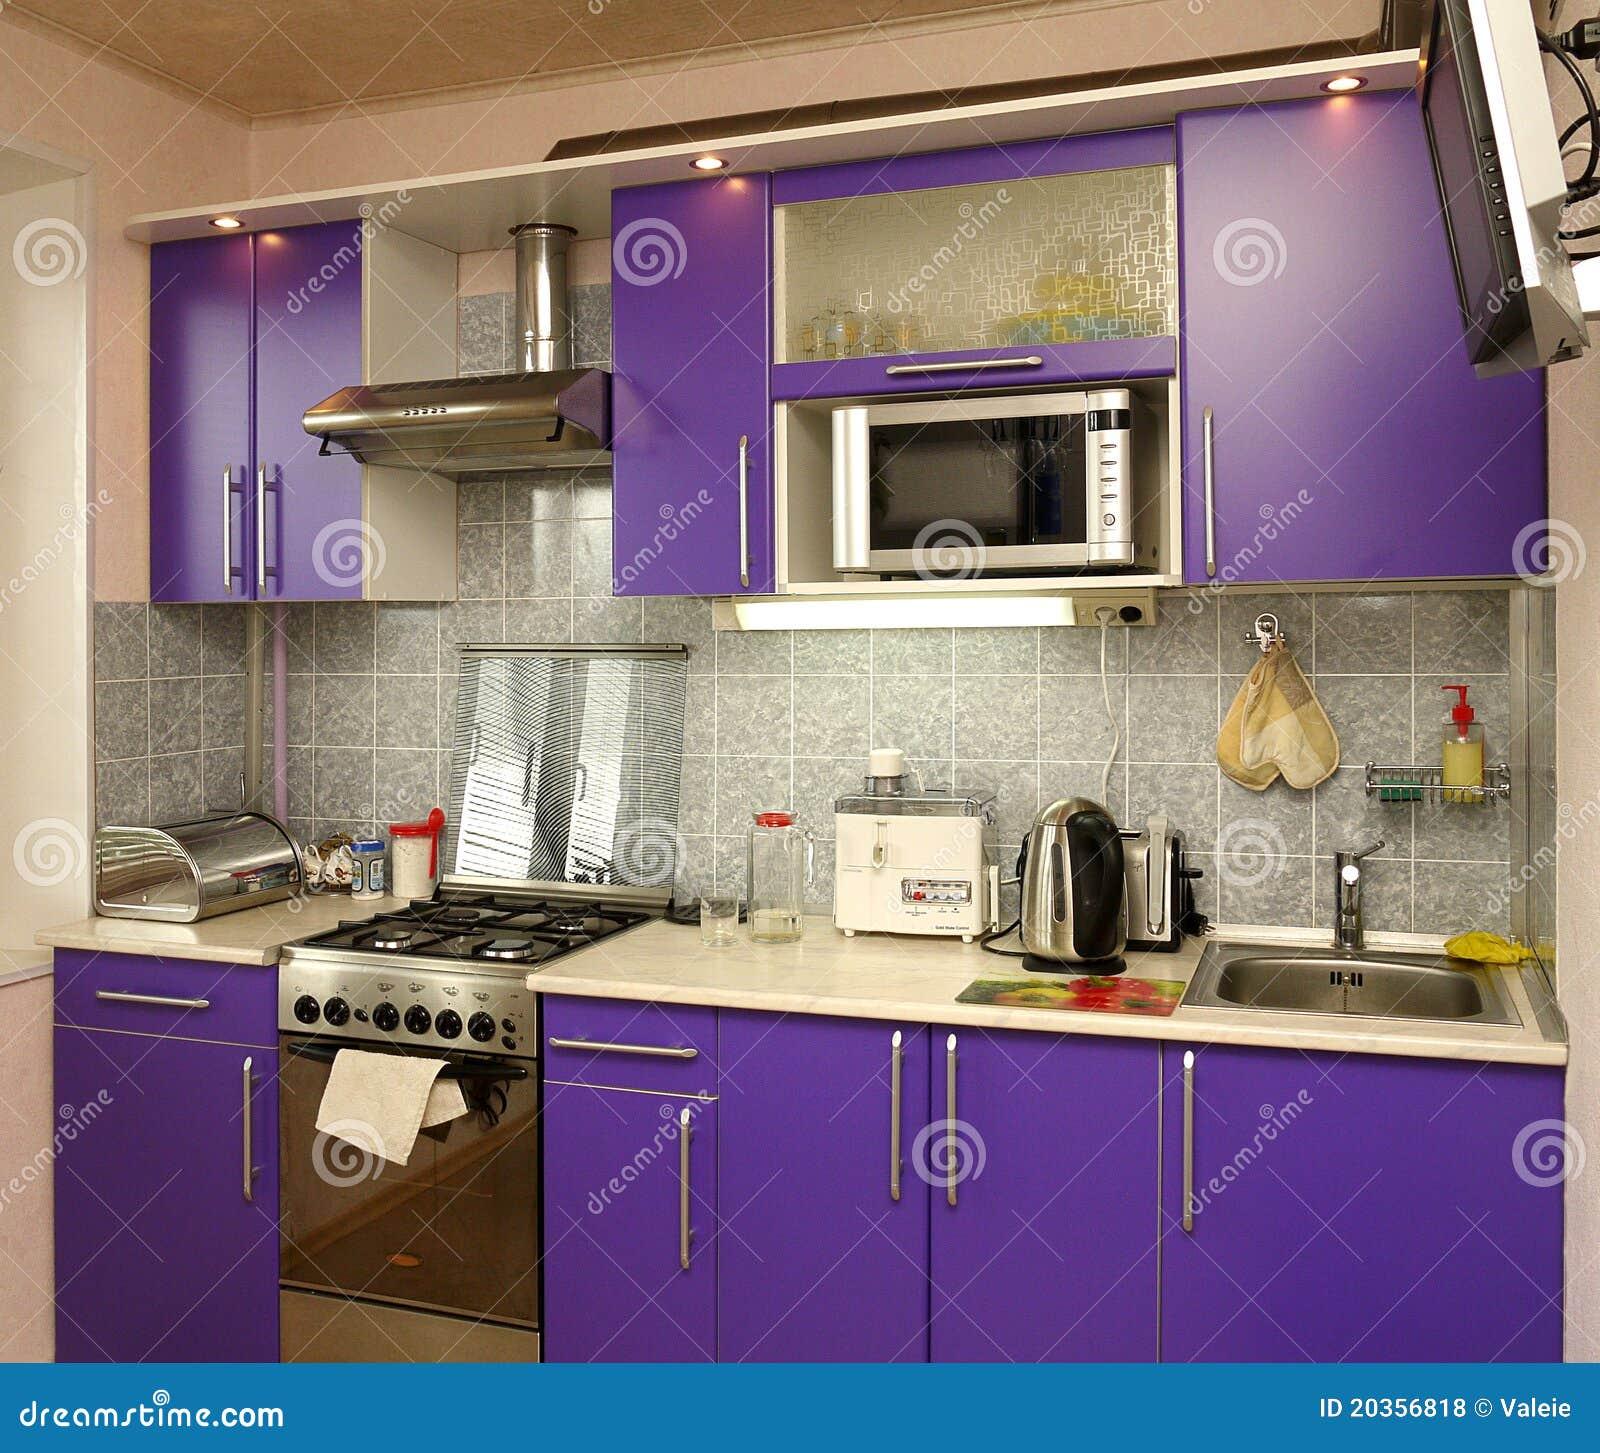 Huishoudapparaten in moderne keuken royalty vrije stock foto's ...